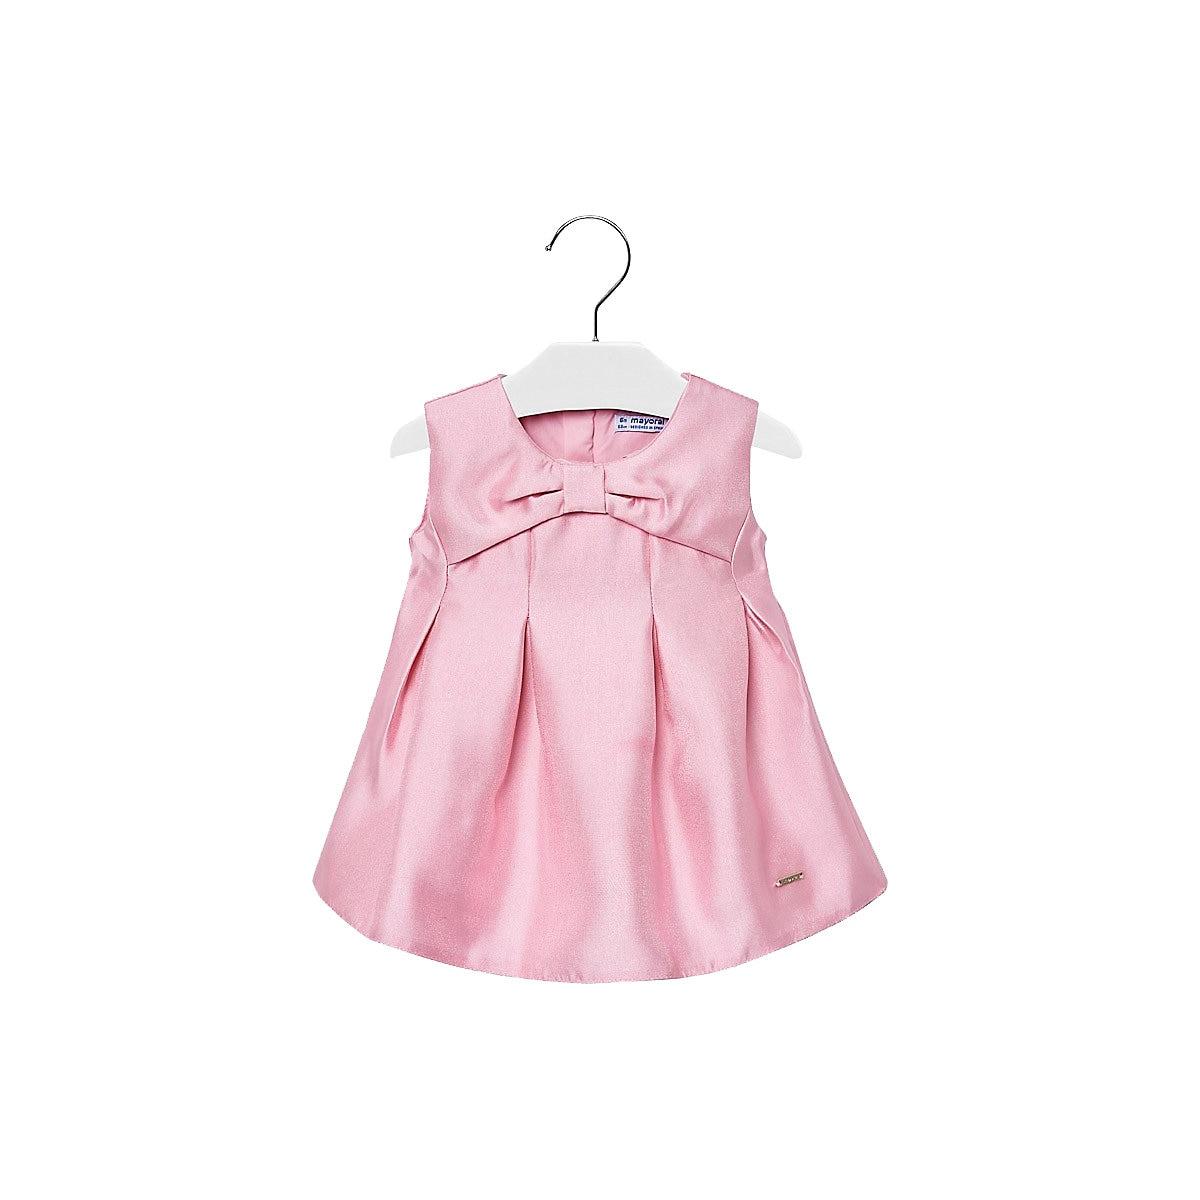 MAYORAL Dresses 10678708 dress for girls baby clothing fashion slim family long sleeve mesh dress for girls